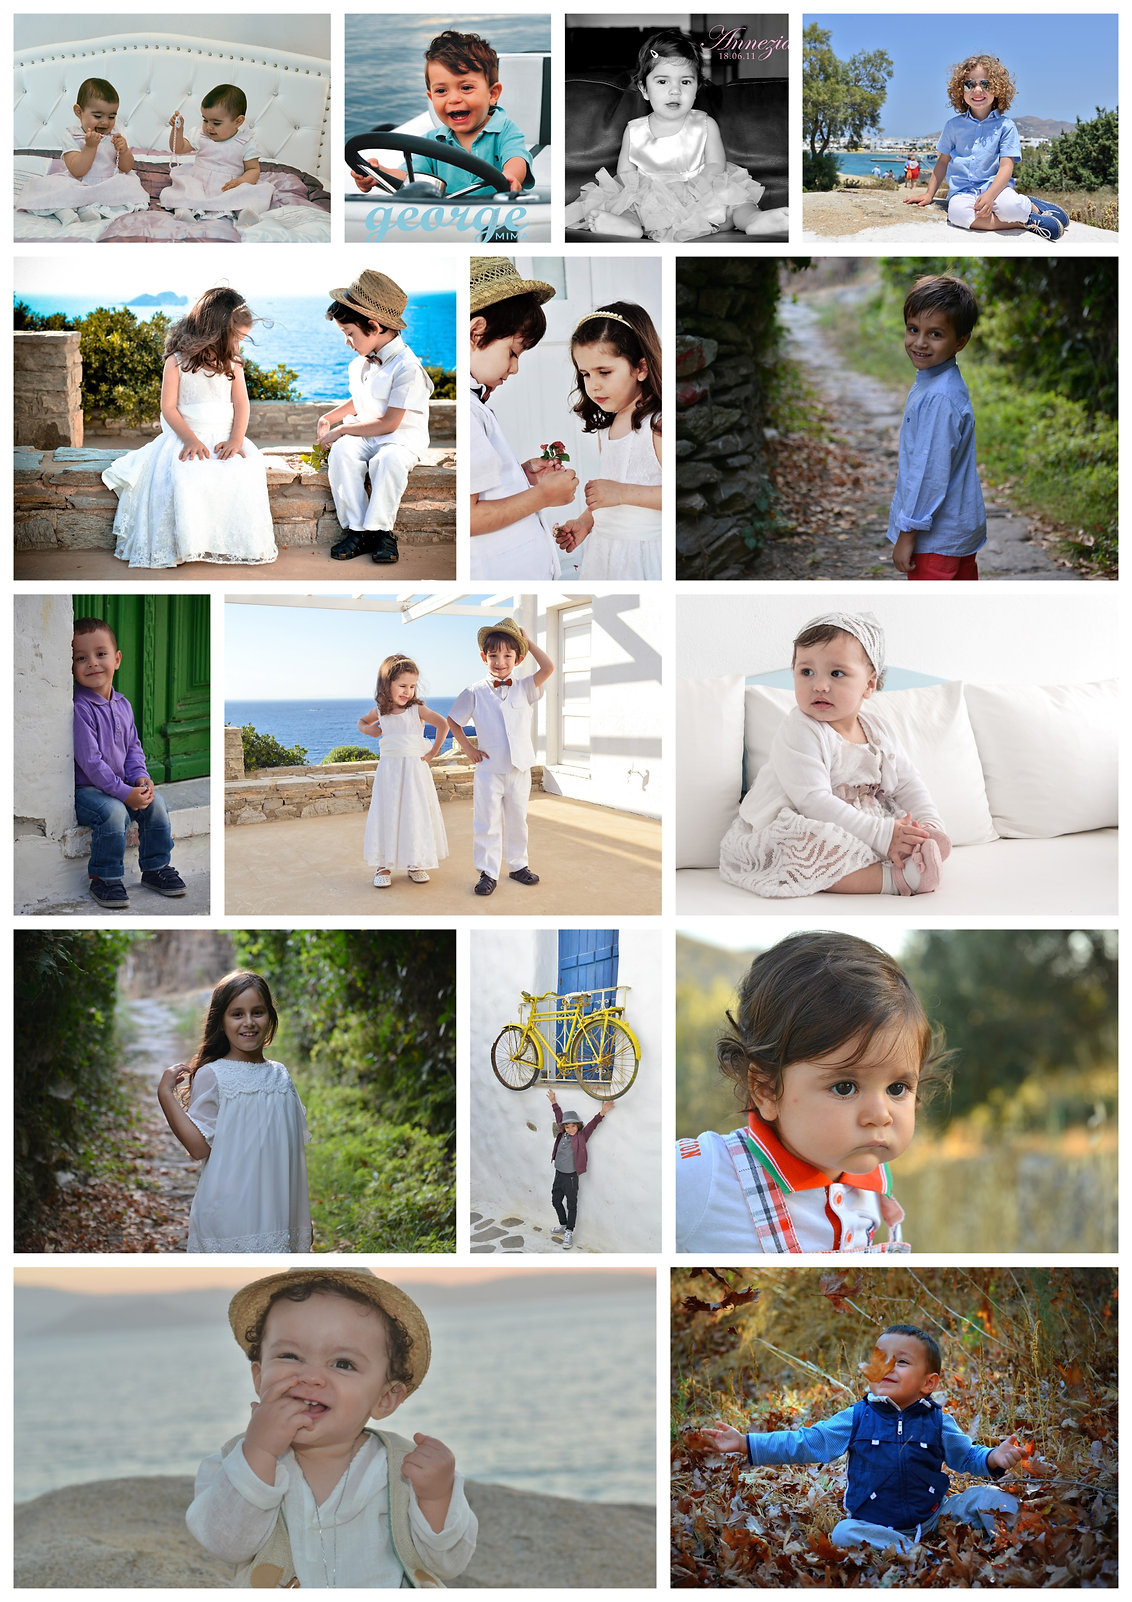 alatas photography (8).jpg